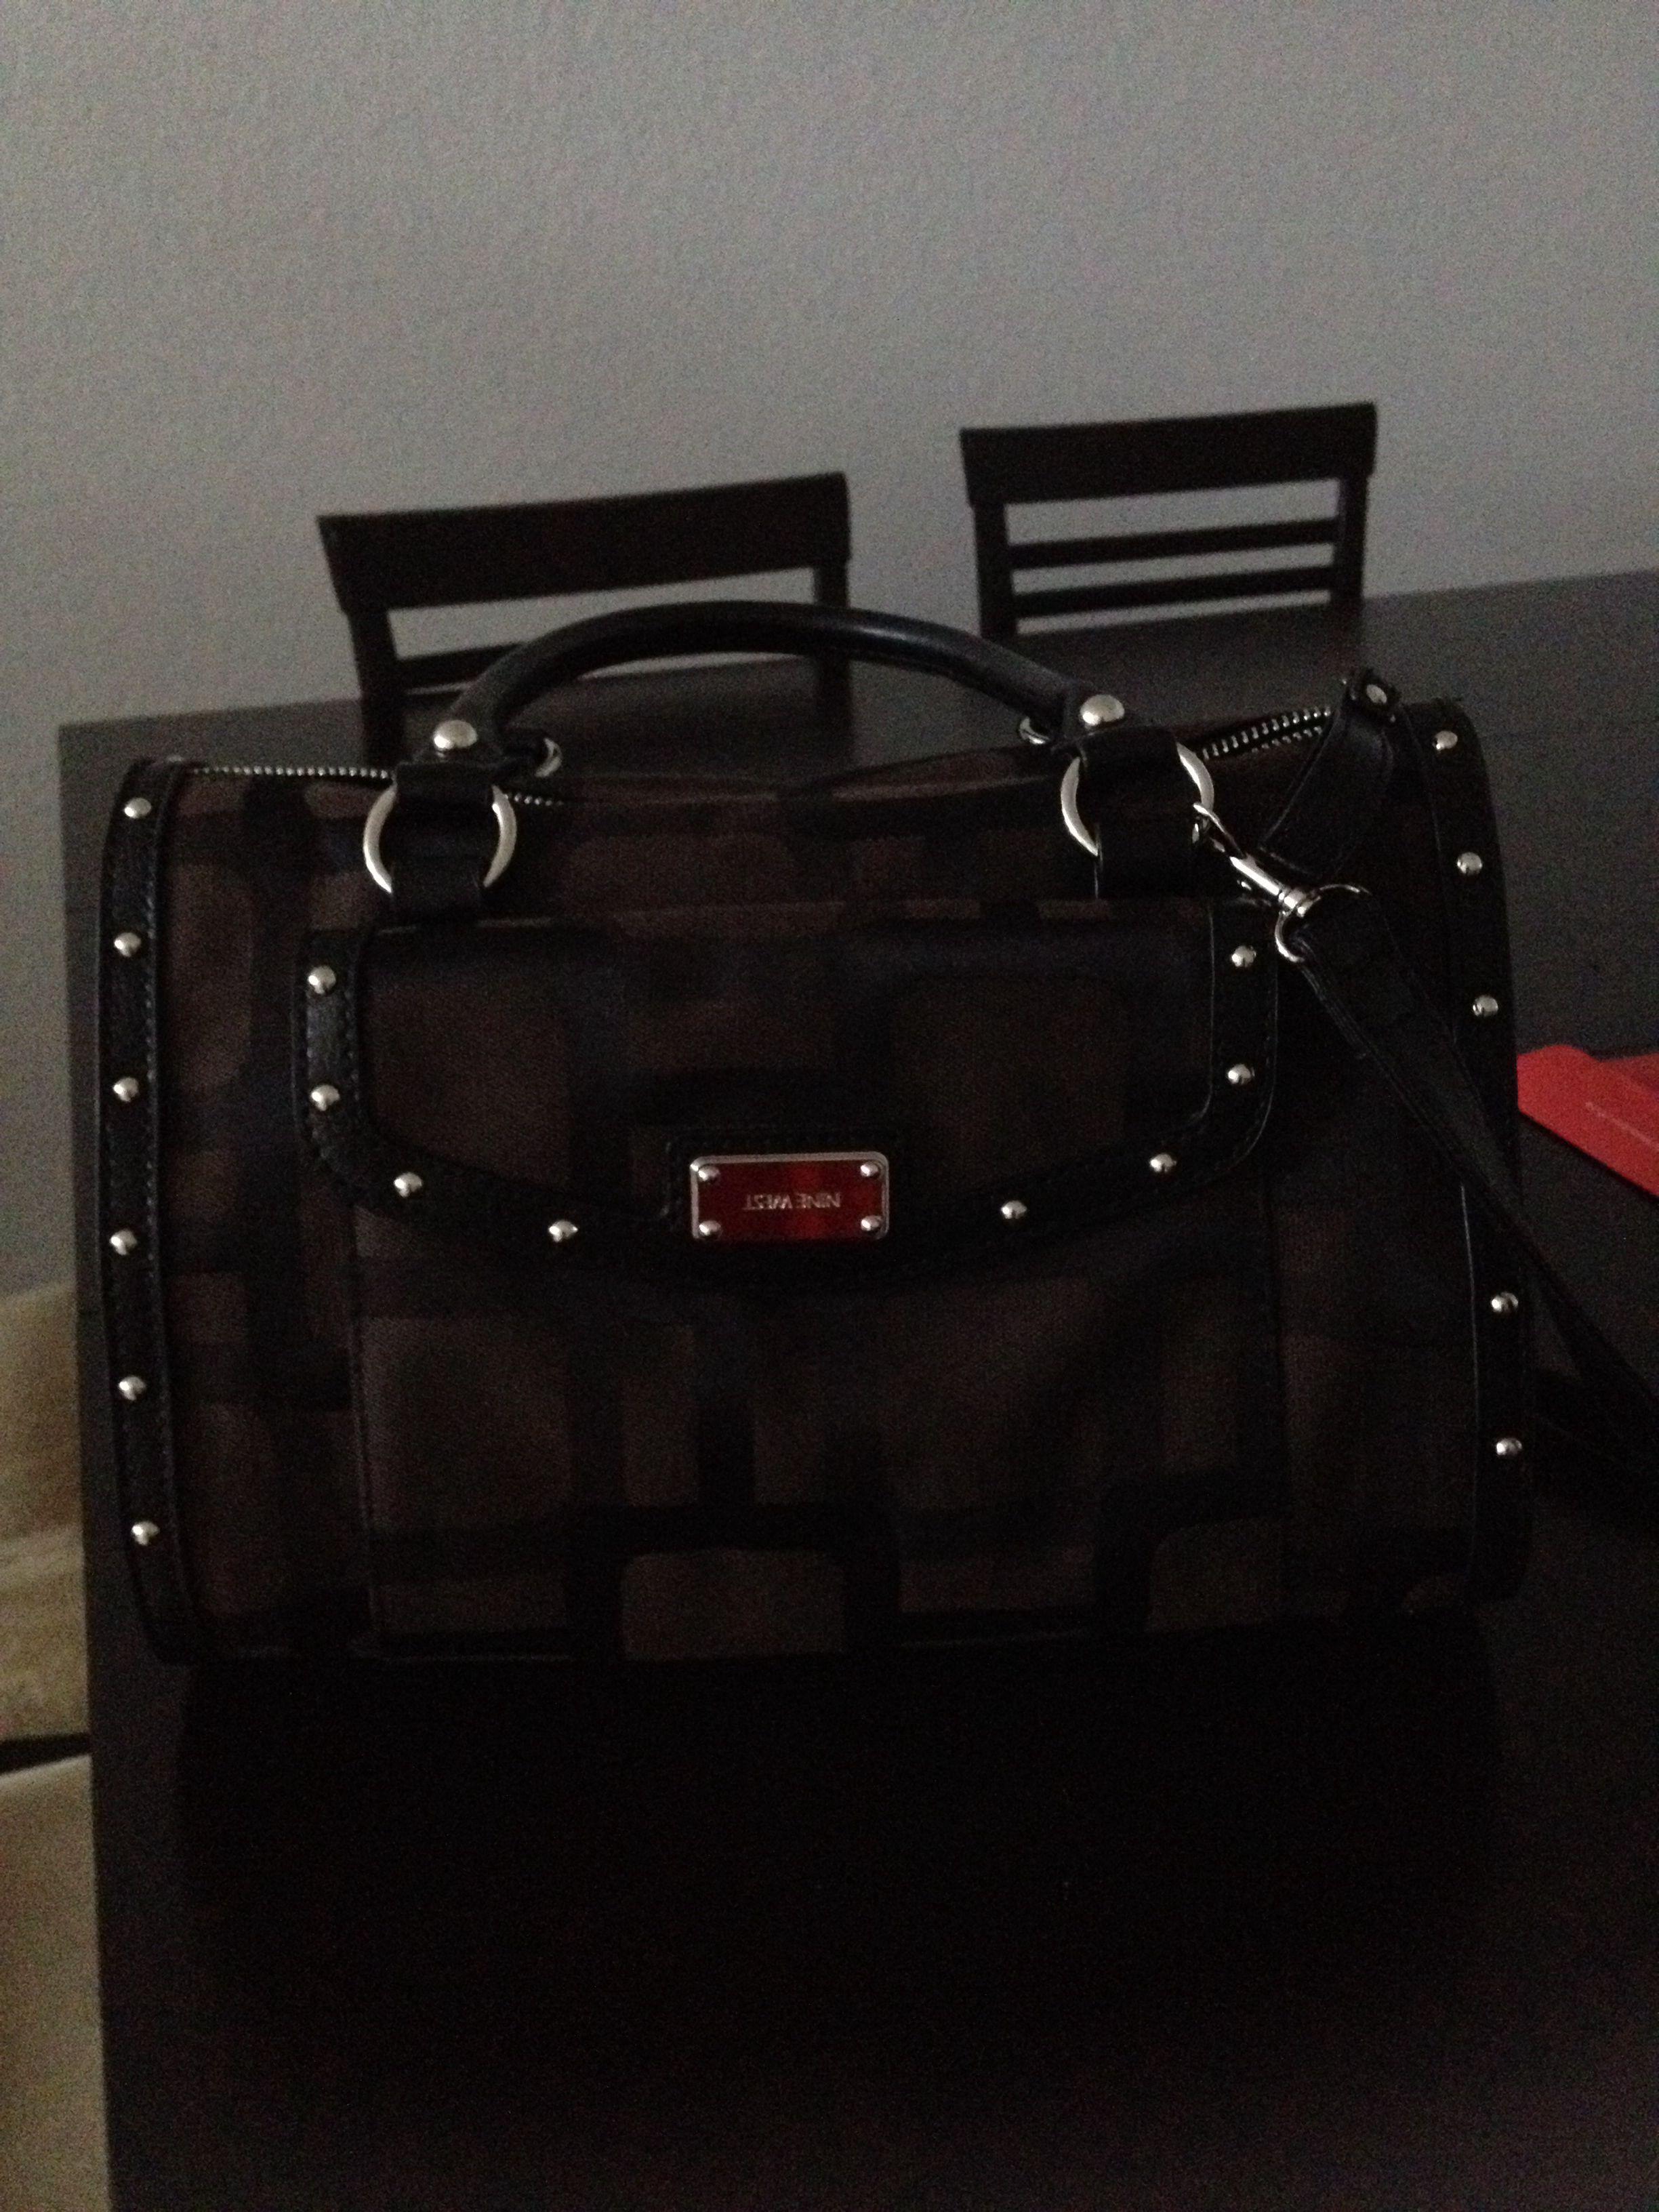 Bargain At Burlington Coat Factory 24 99 Nine West Handbag Love It